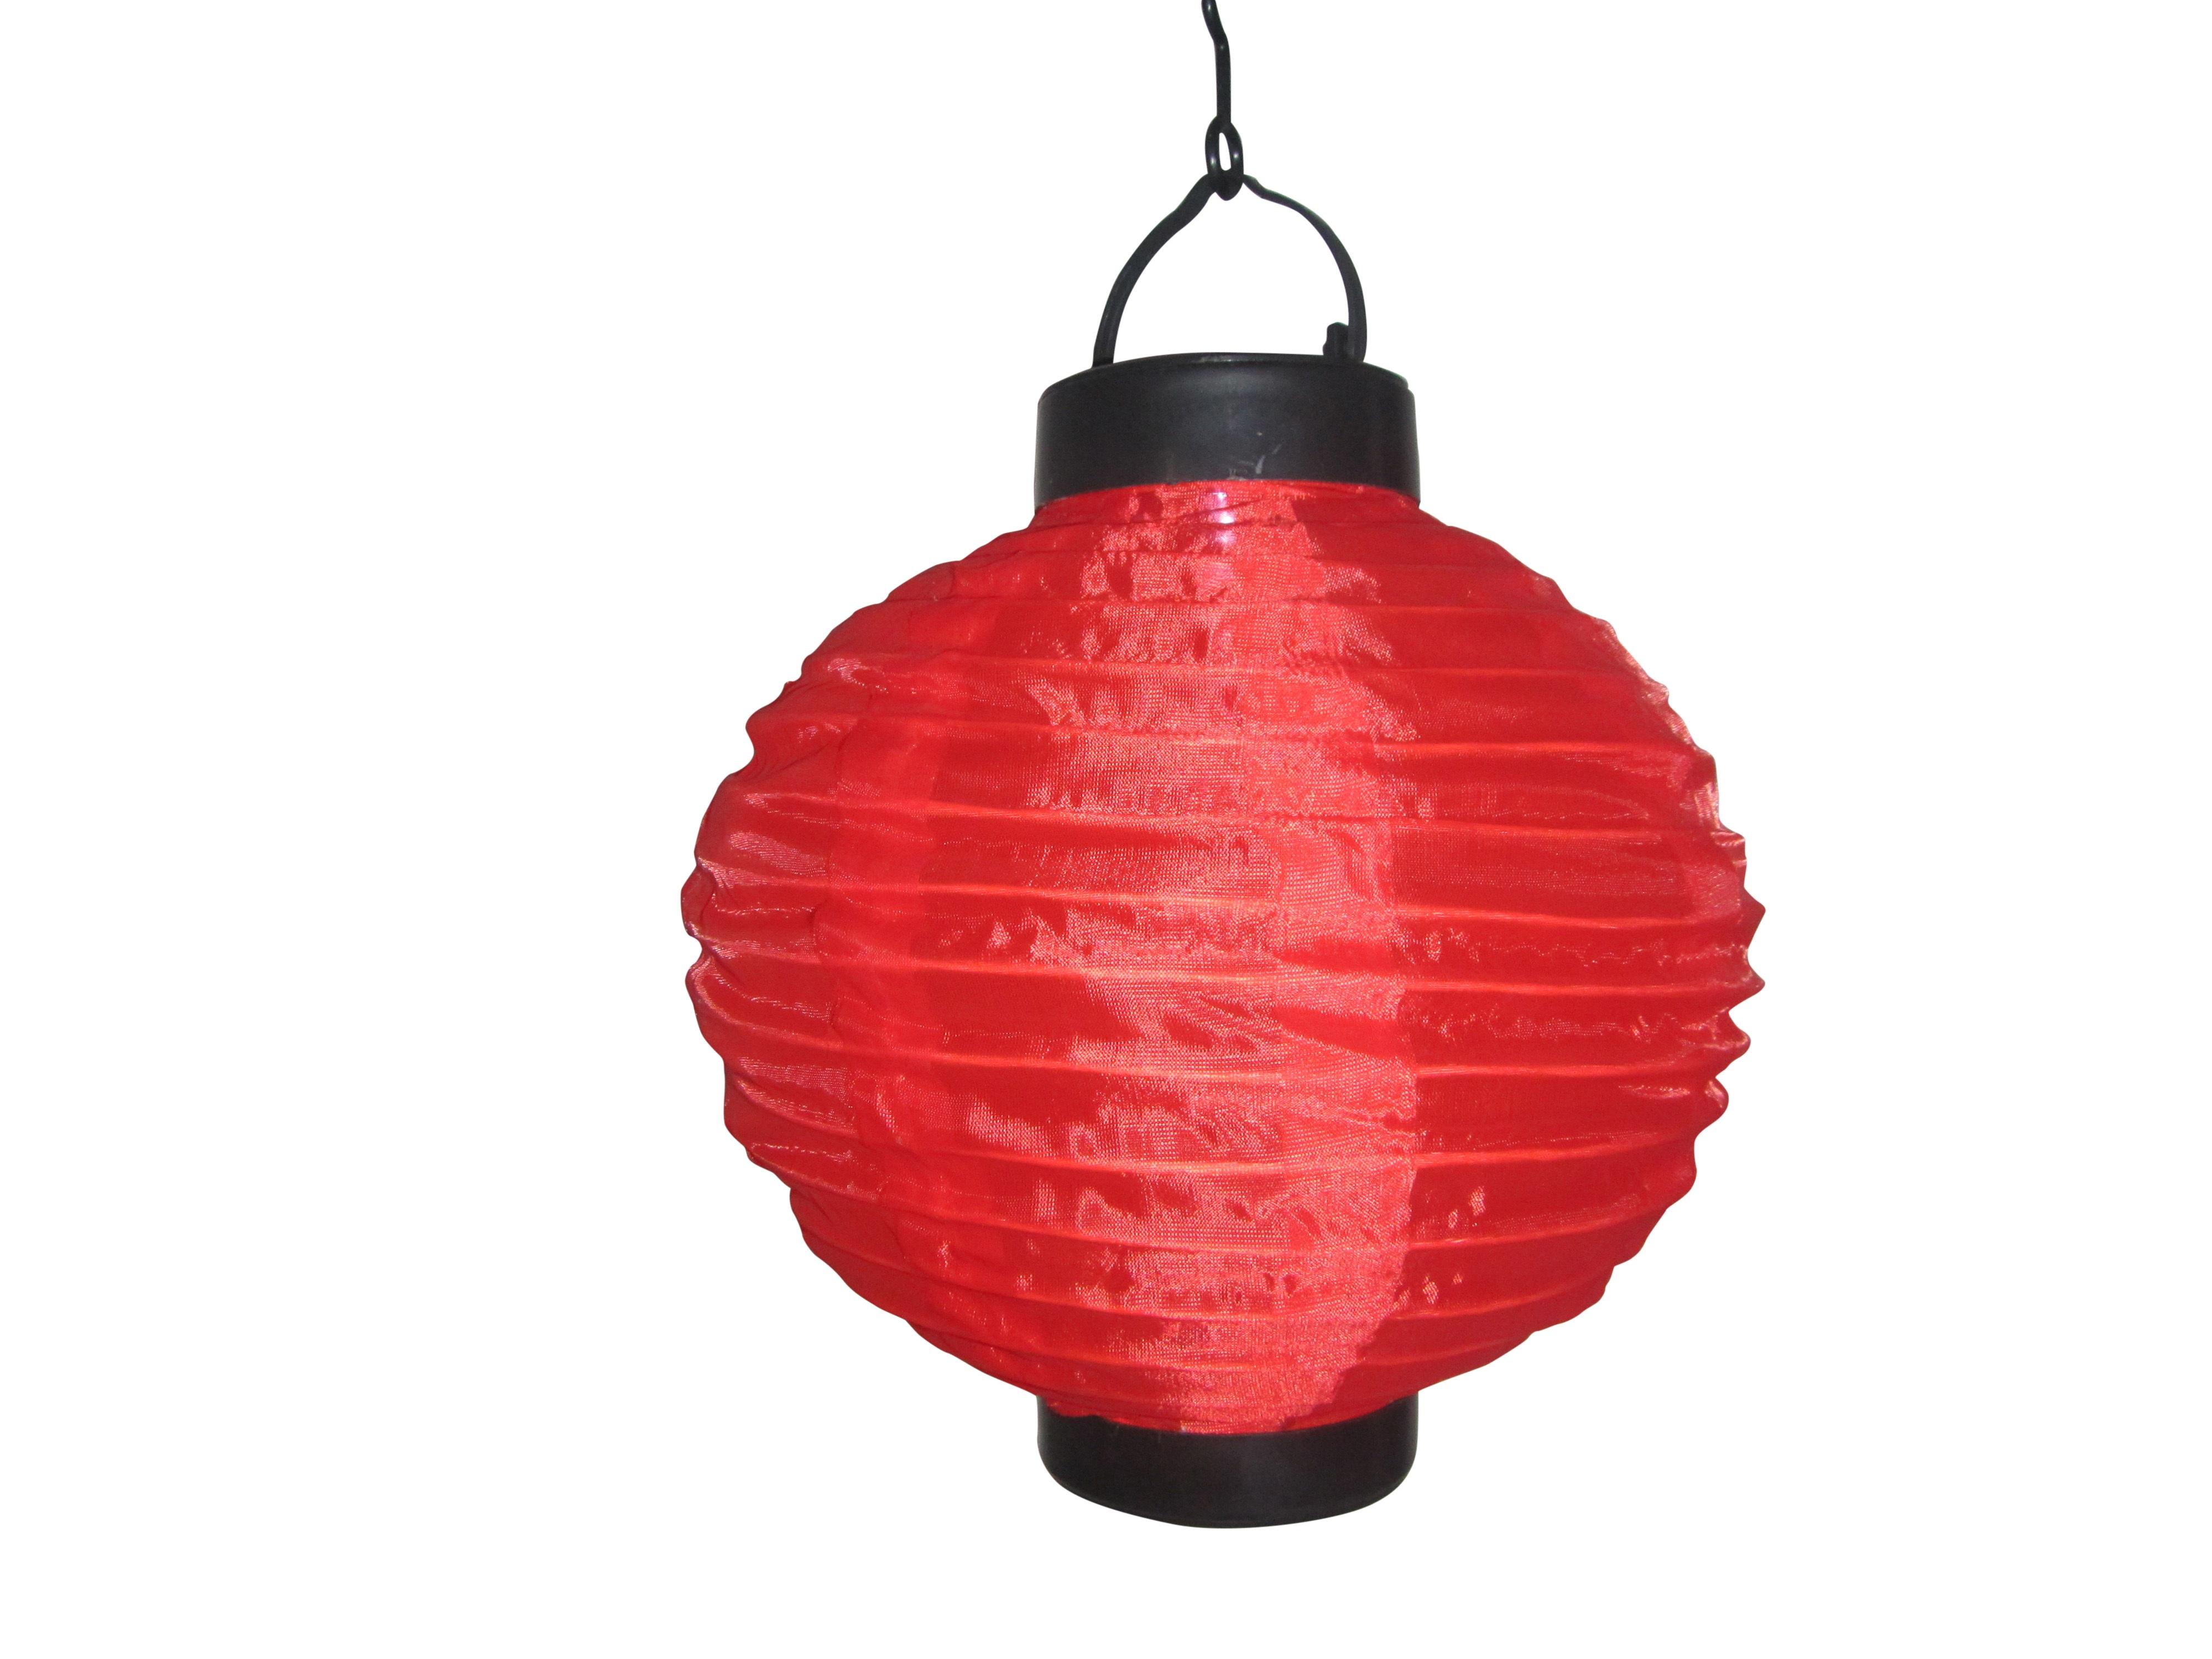 Celebration Lantern Red Lamp Lighting Decor Light Fixture Box